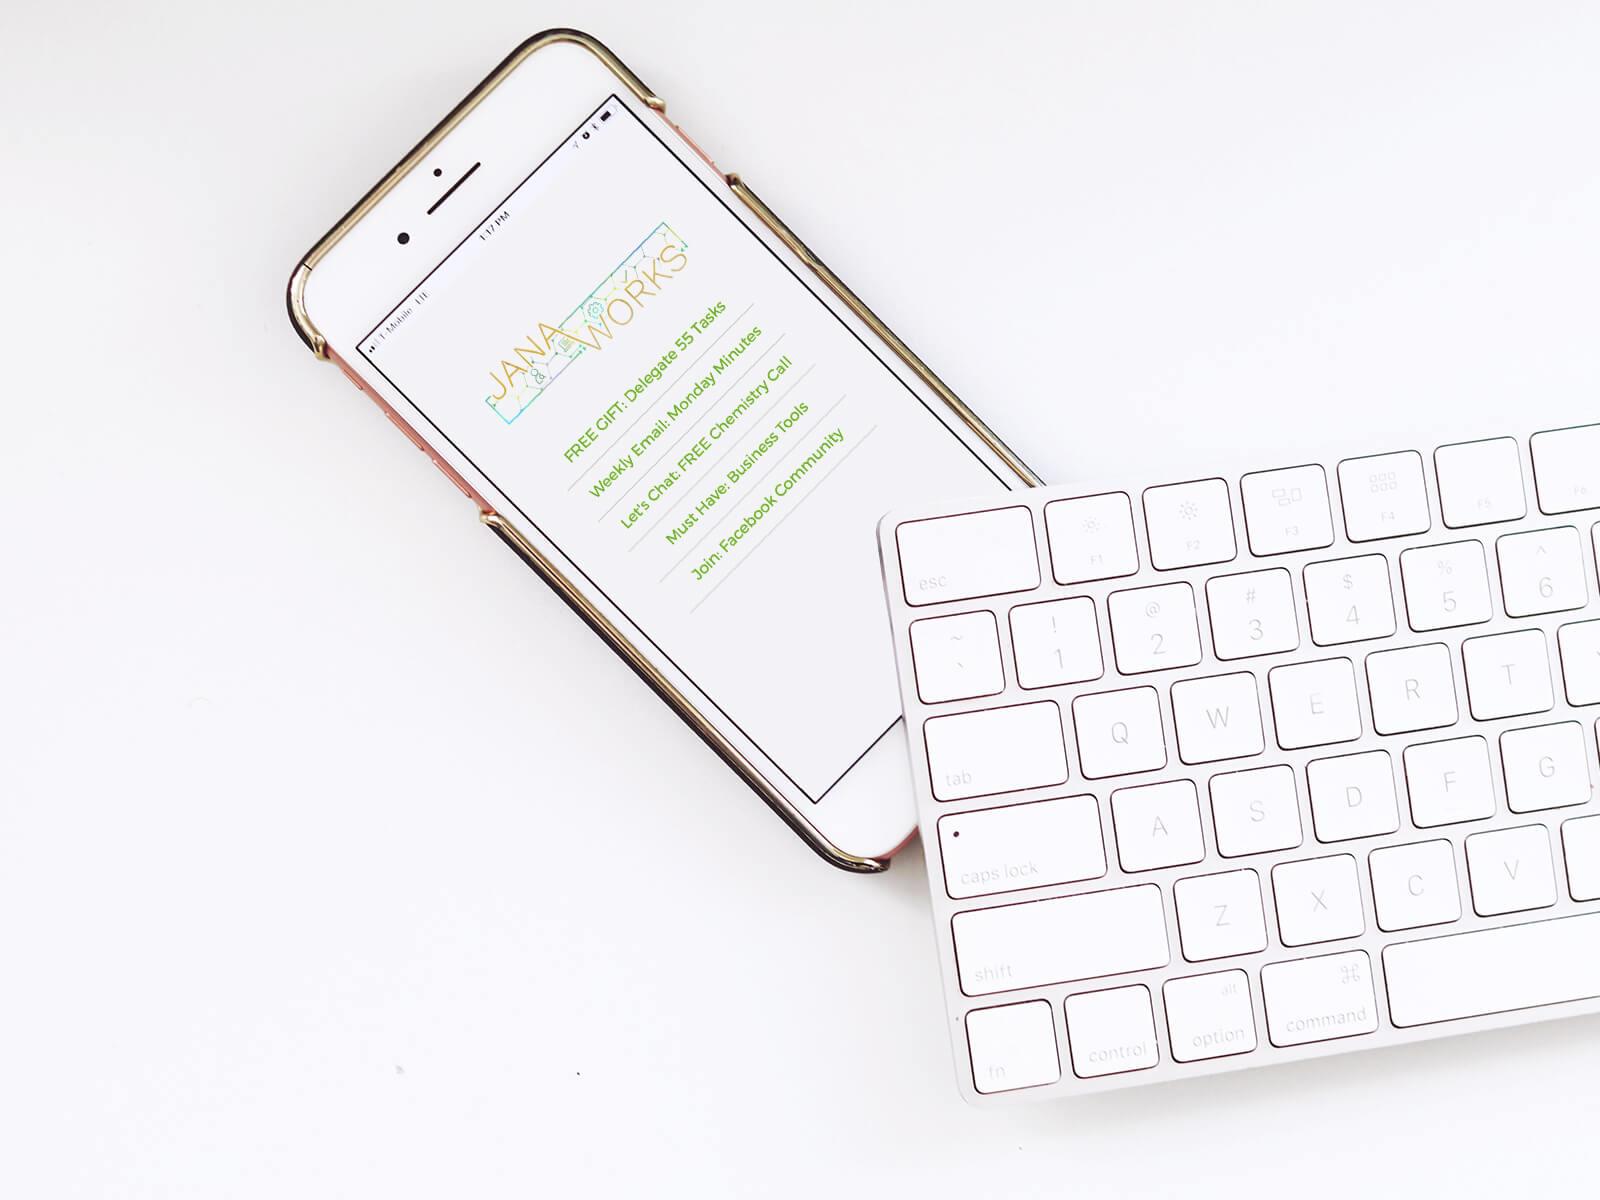 Jana Works Links Page on a mobile device